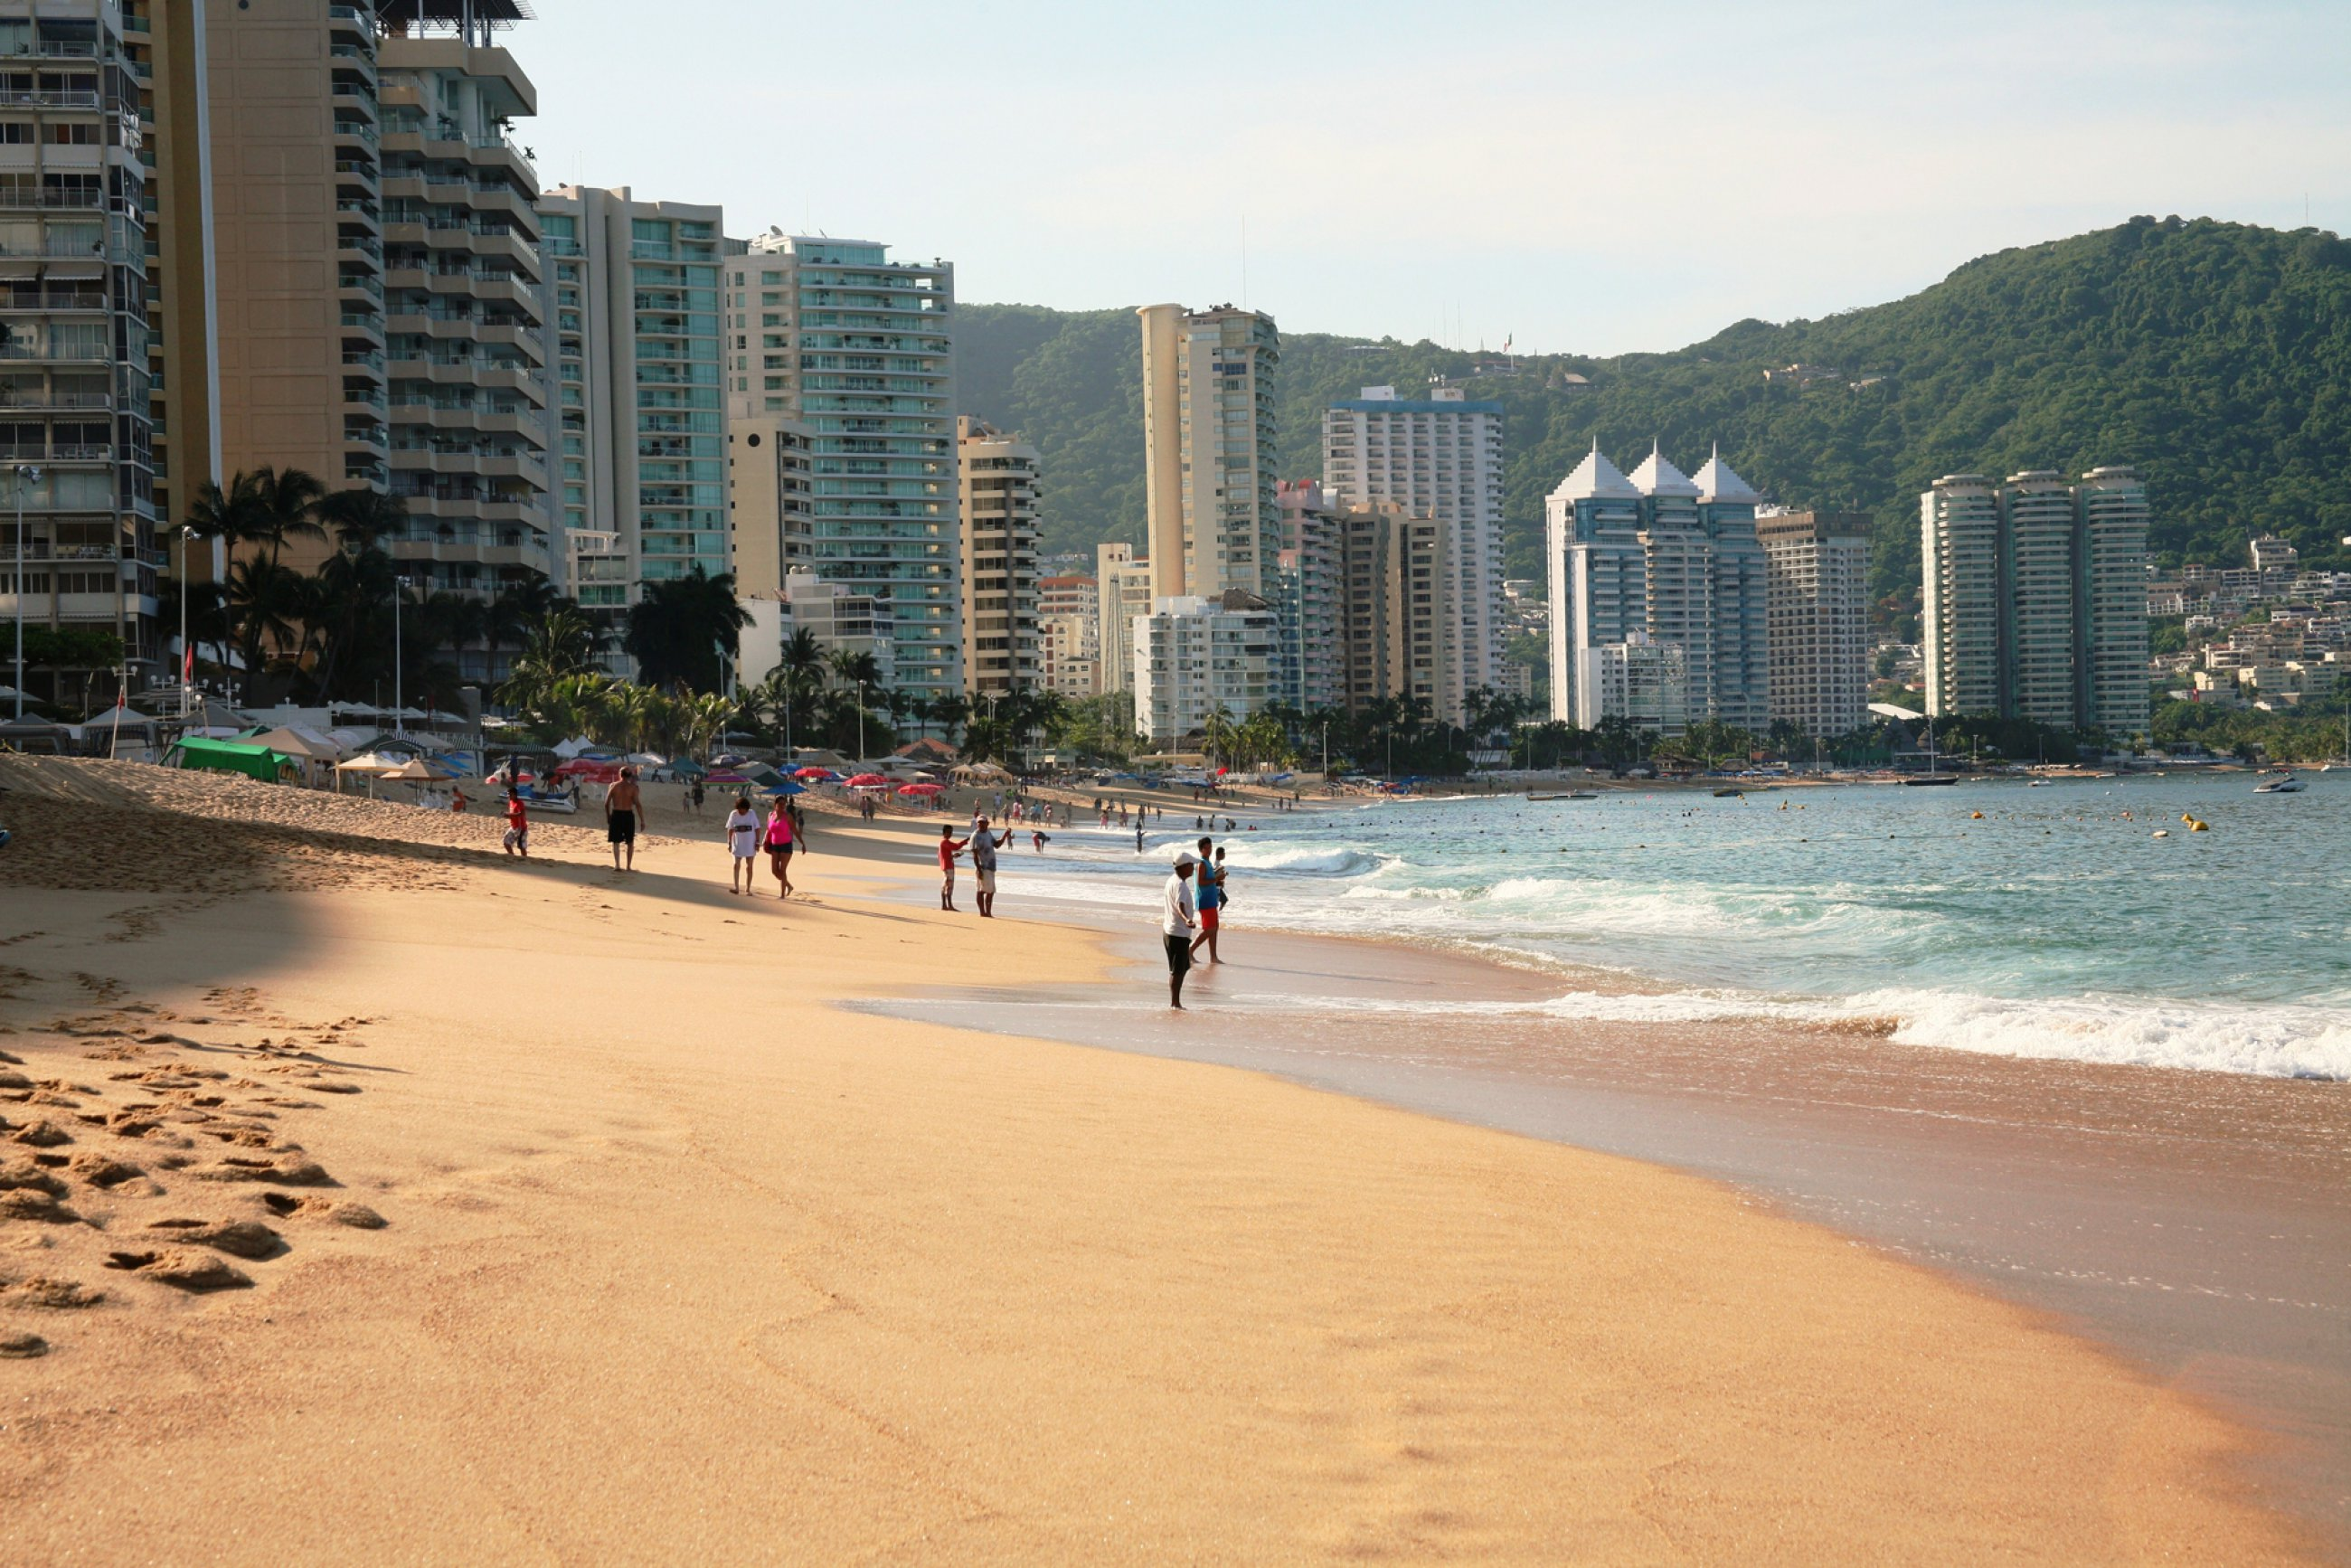 https://bubo.sk/uploads/galleries/5010/acapulco-katka-liska-acapulco-img-5029.jpg